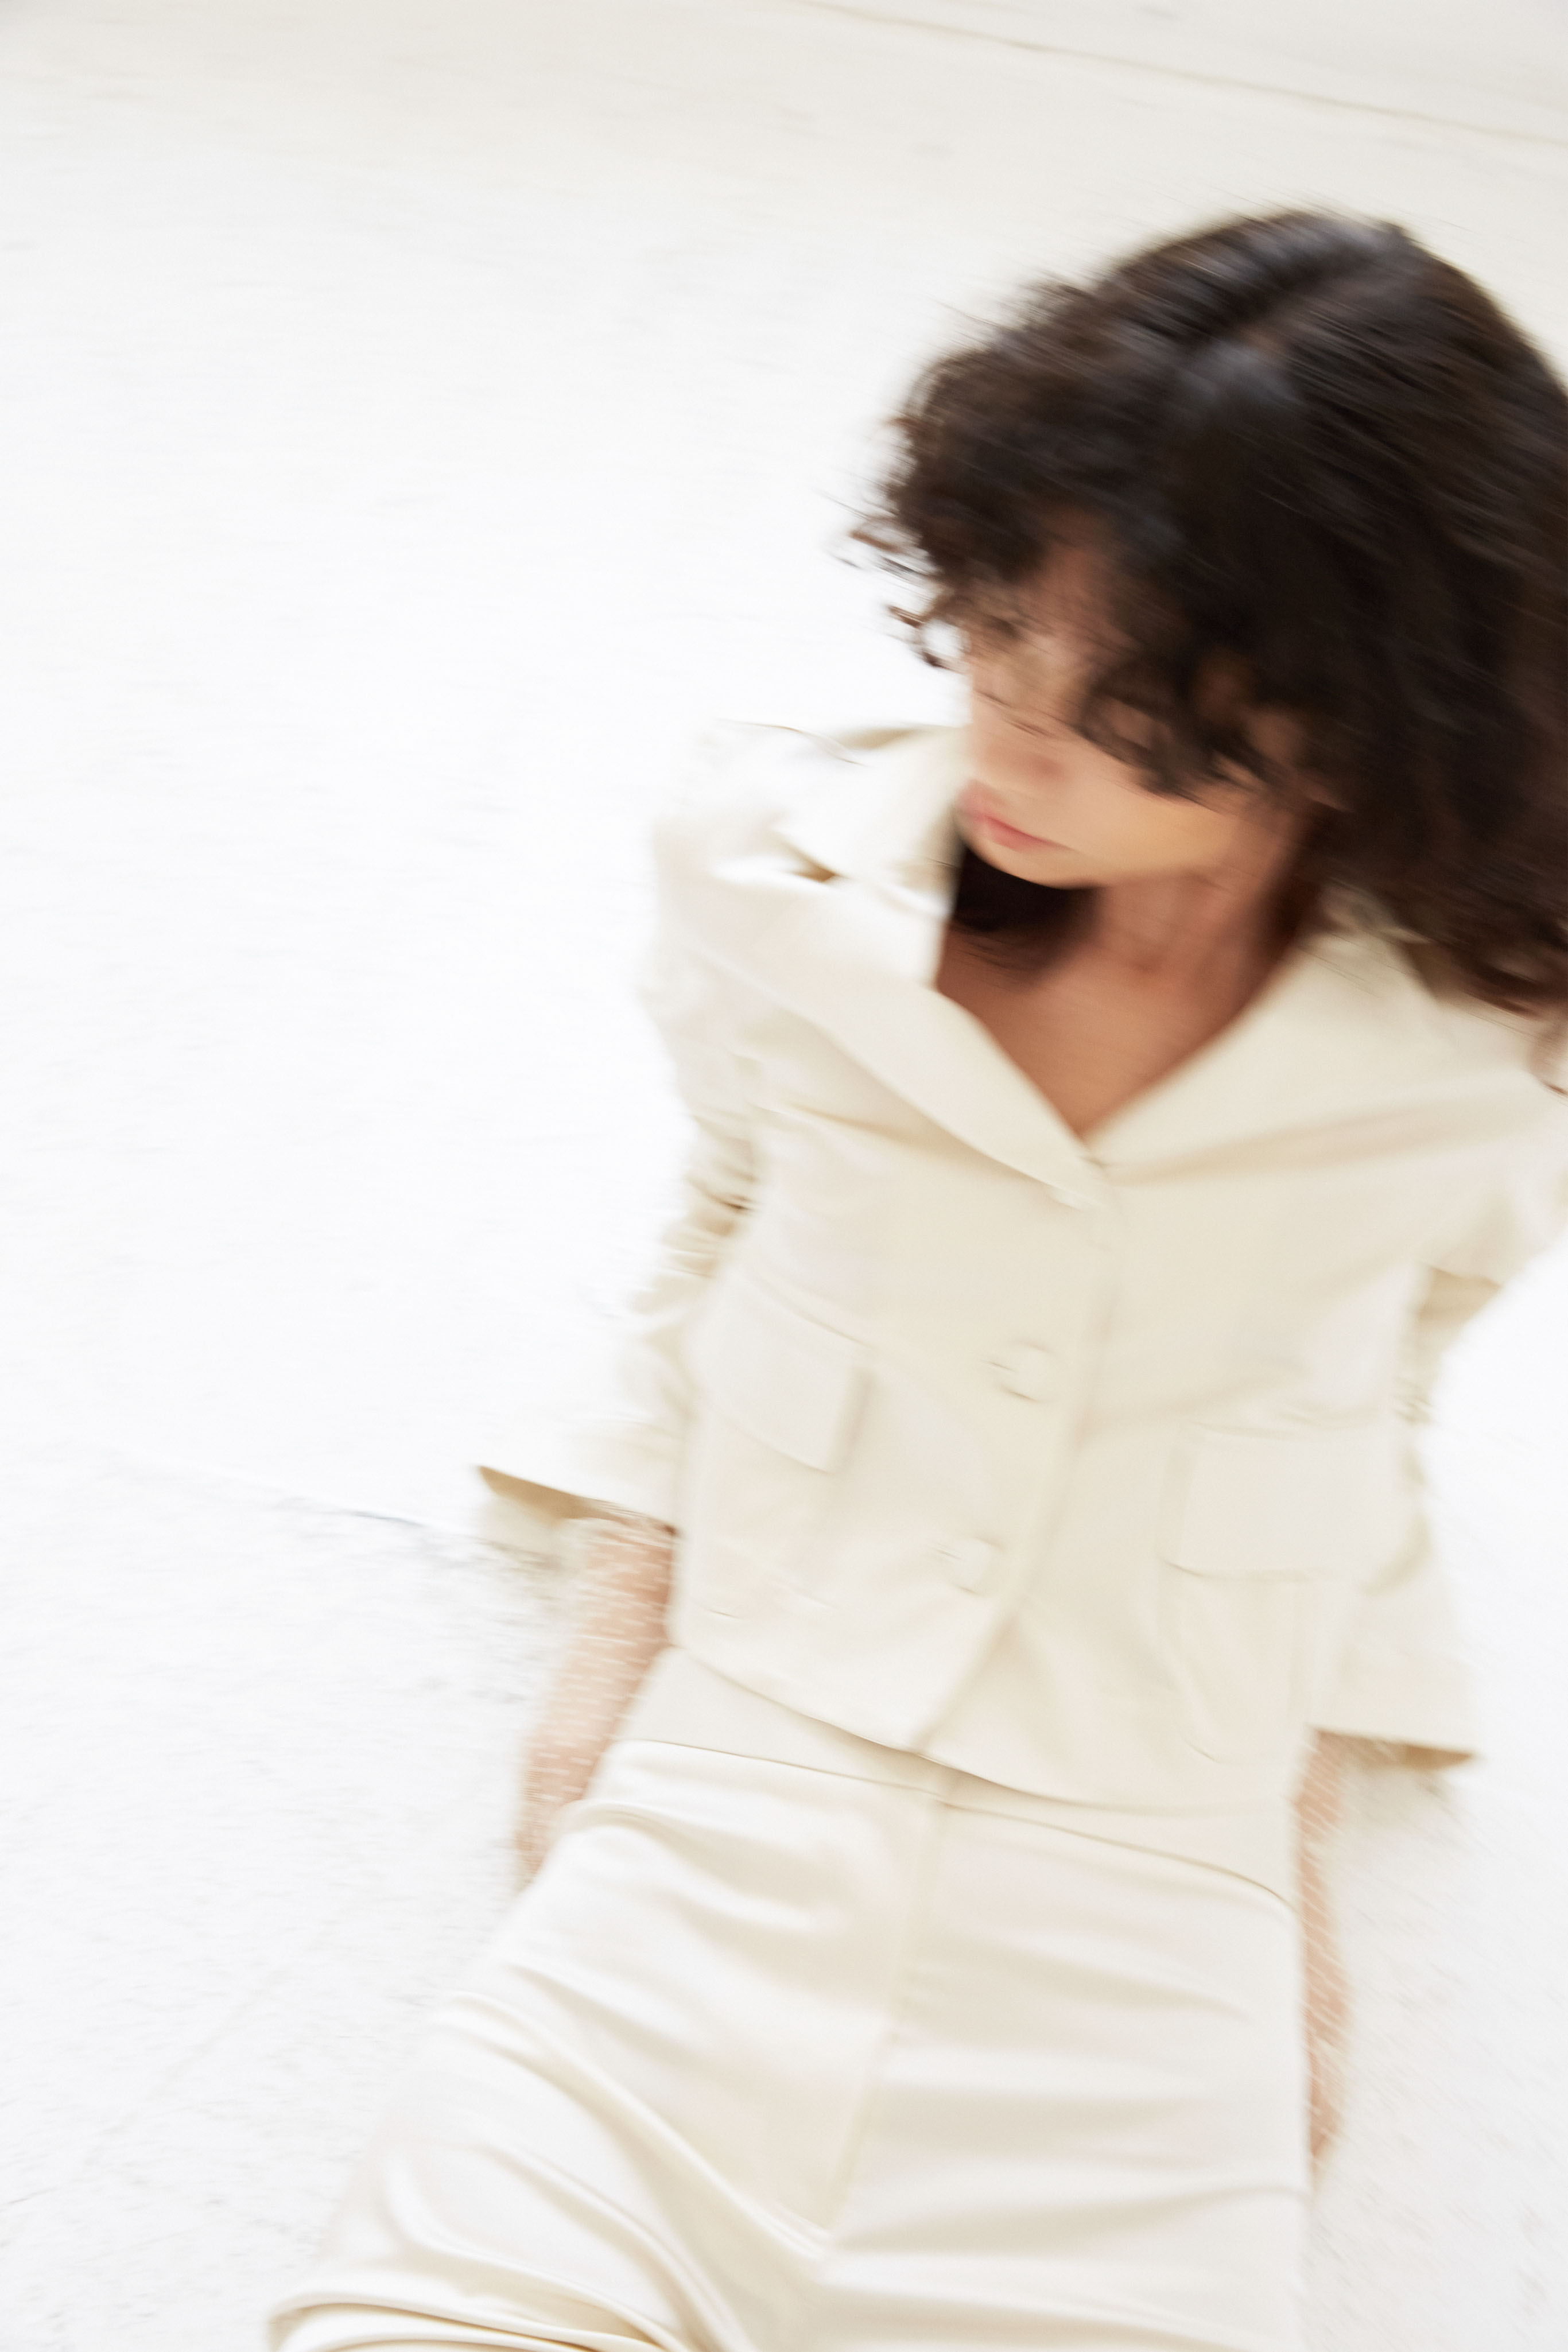 lein wedding dress spring 2020 separates bell sleeve white jacket button